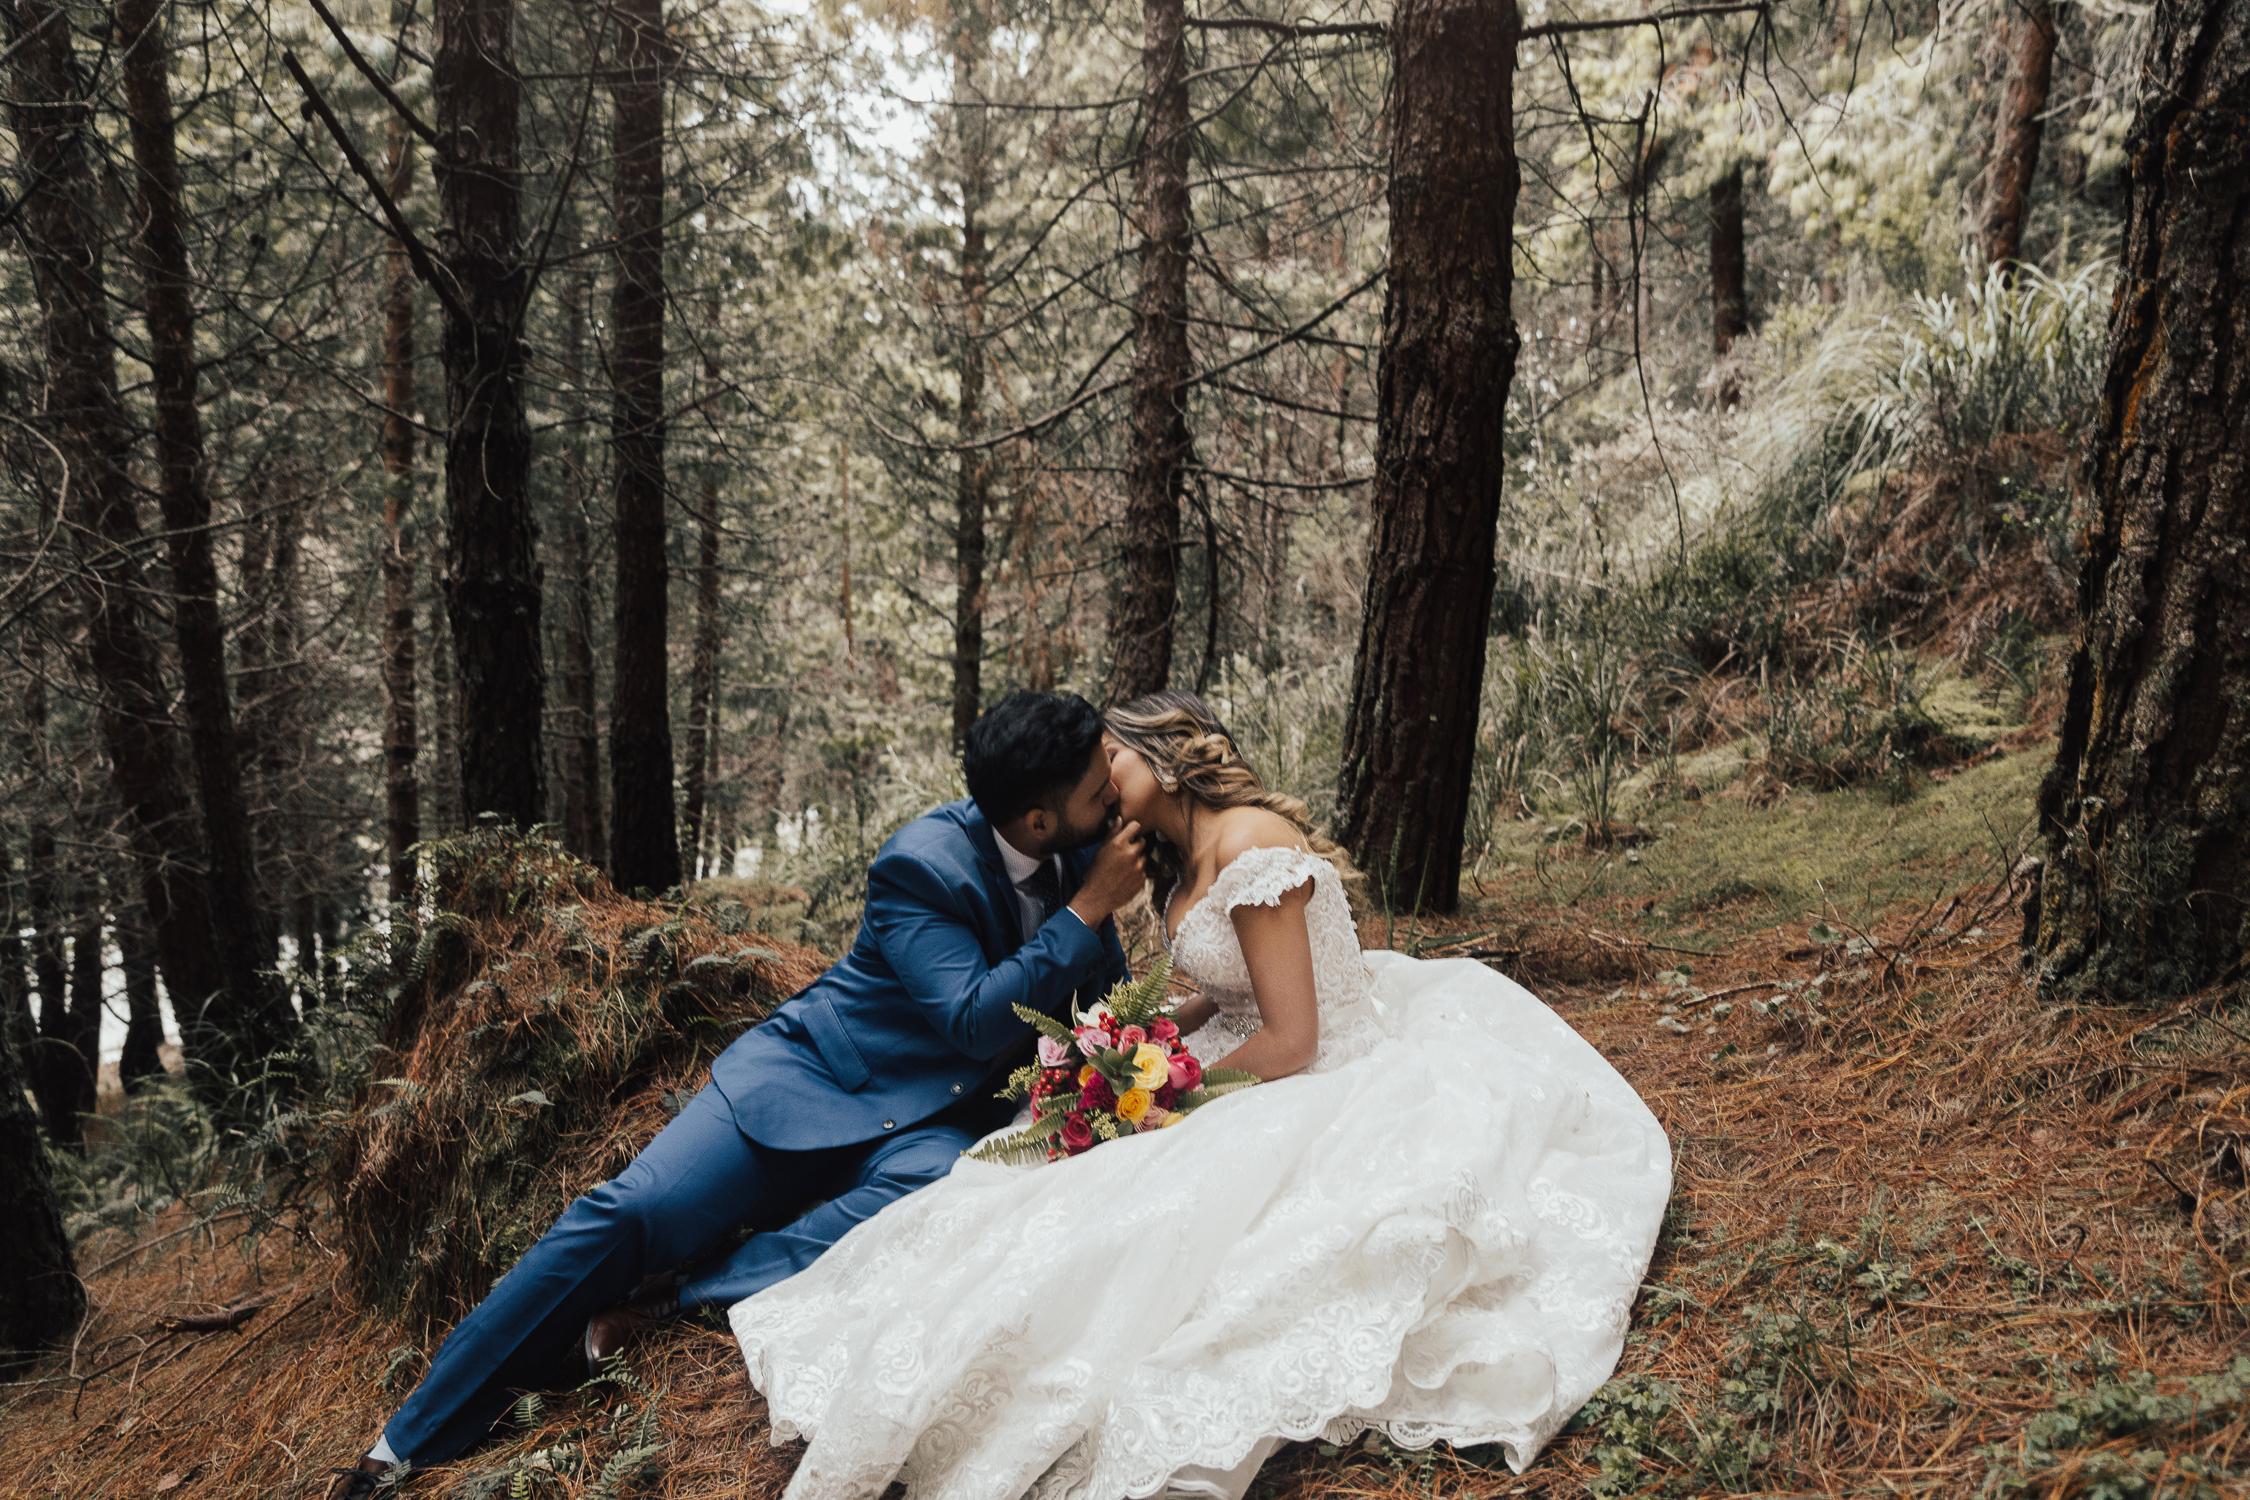 Michelle-Agurto-Fotografia-Bodas-Destination-Wedding-Photographer-Ecuador-Sesion-Johanna-Eduardo-41.JPG